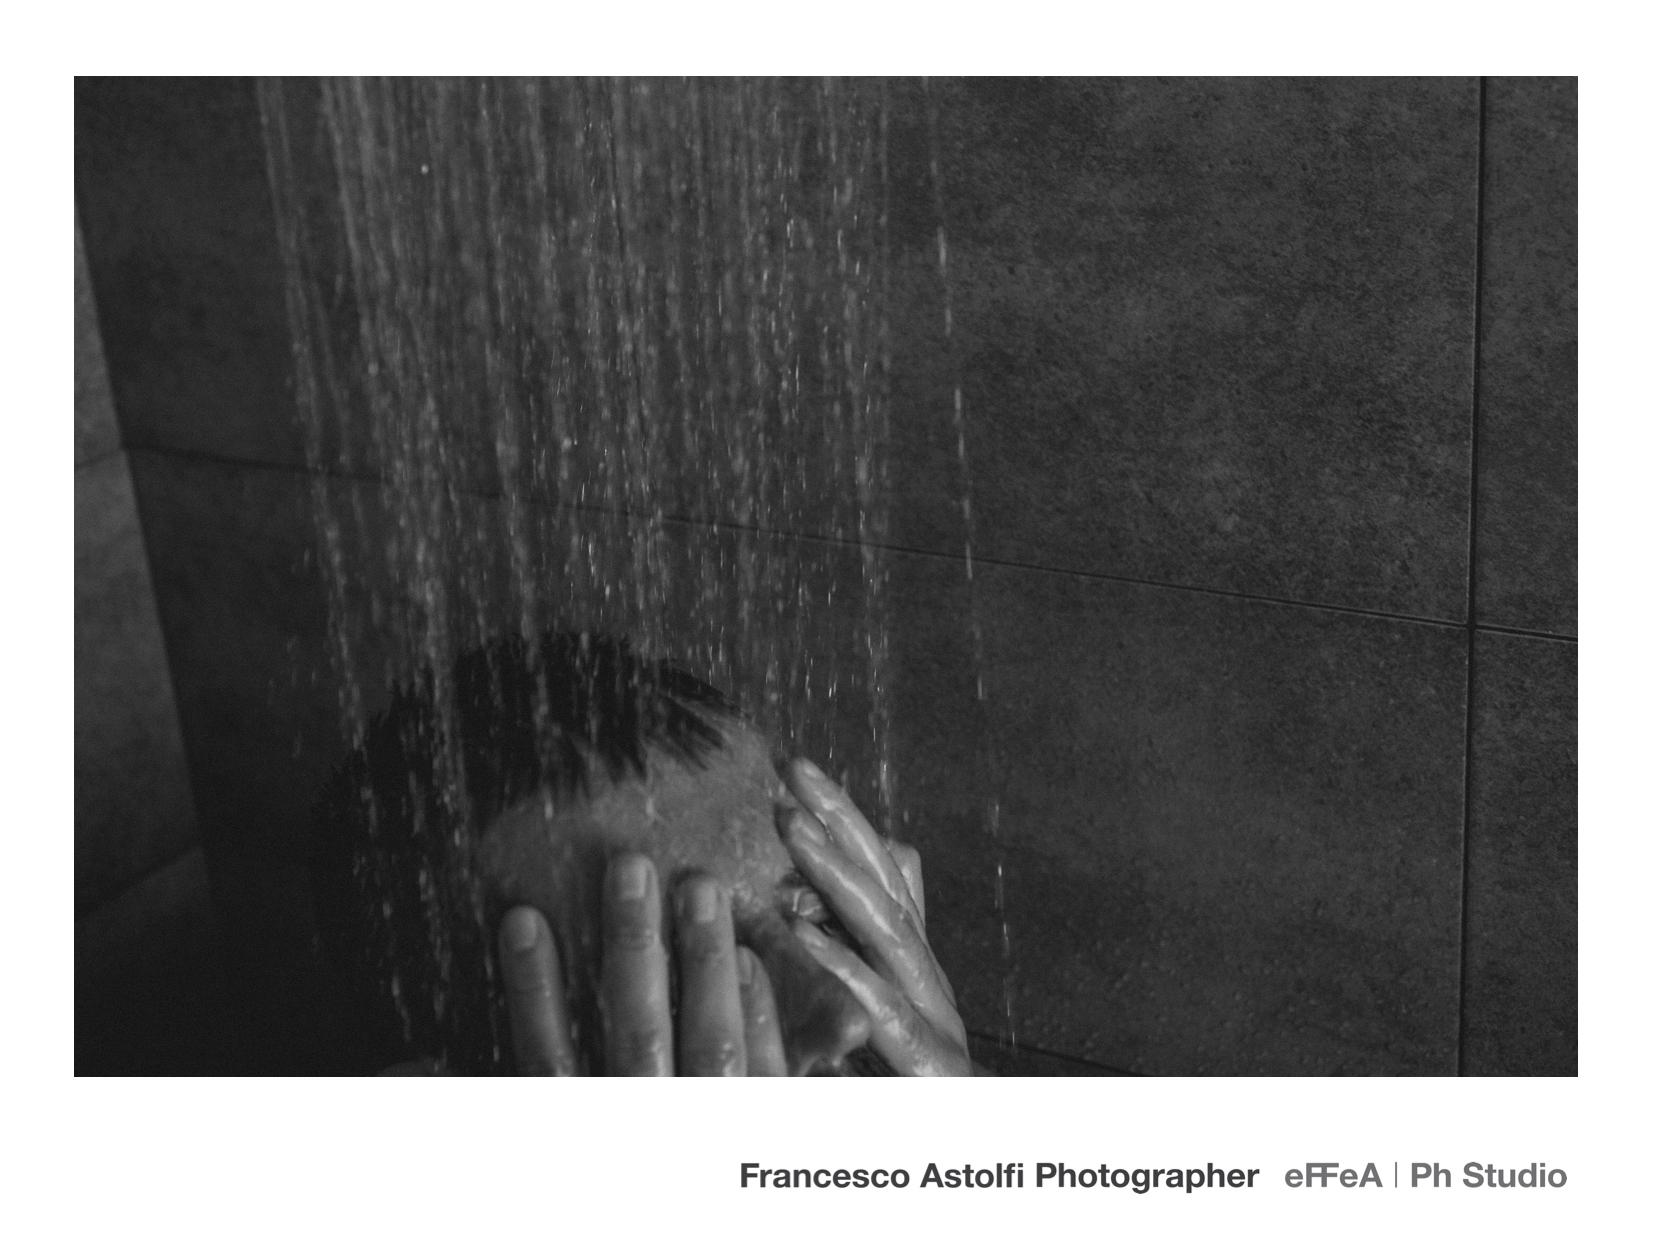 008 - ANDREA S. - Photo by Francesco Astolfi